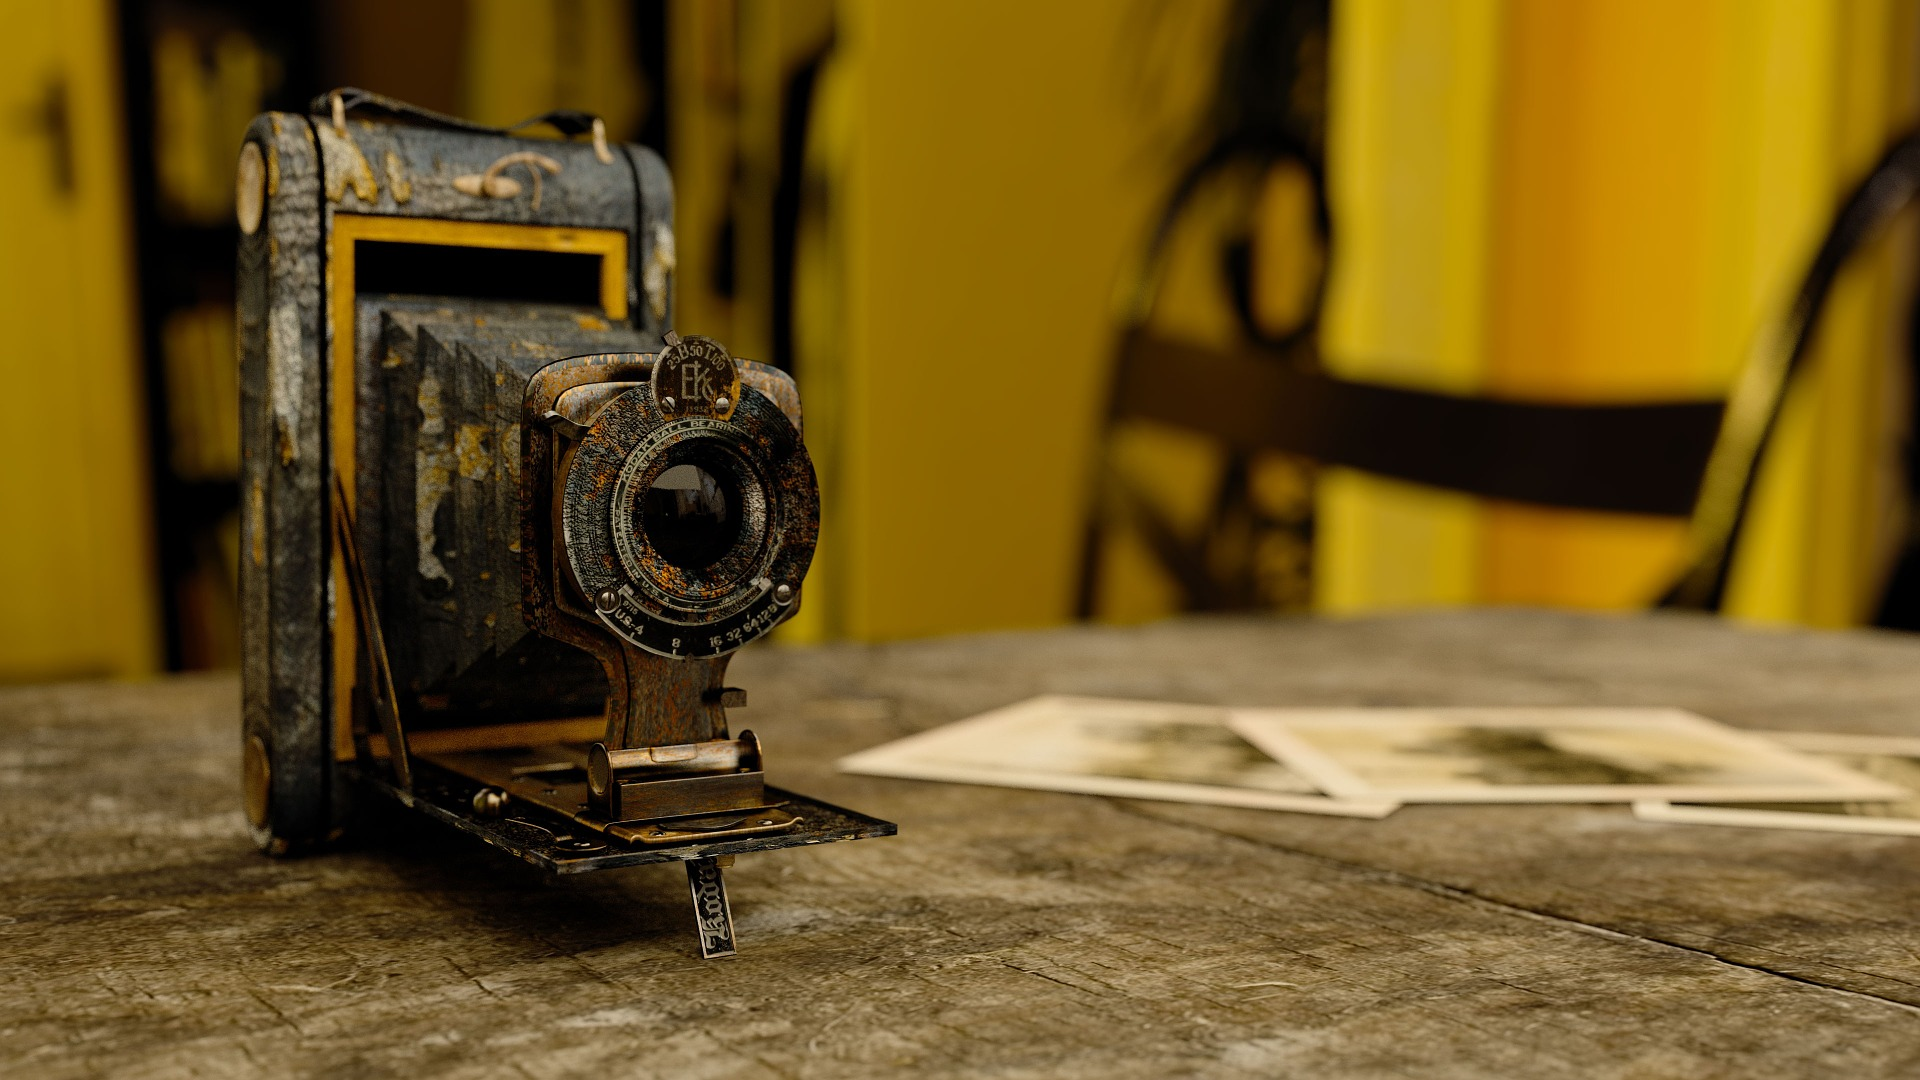 pic of vintage camera